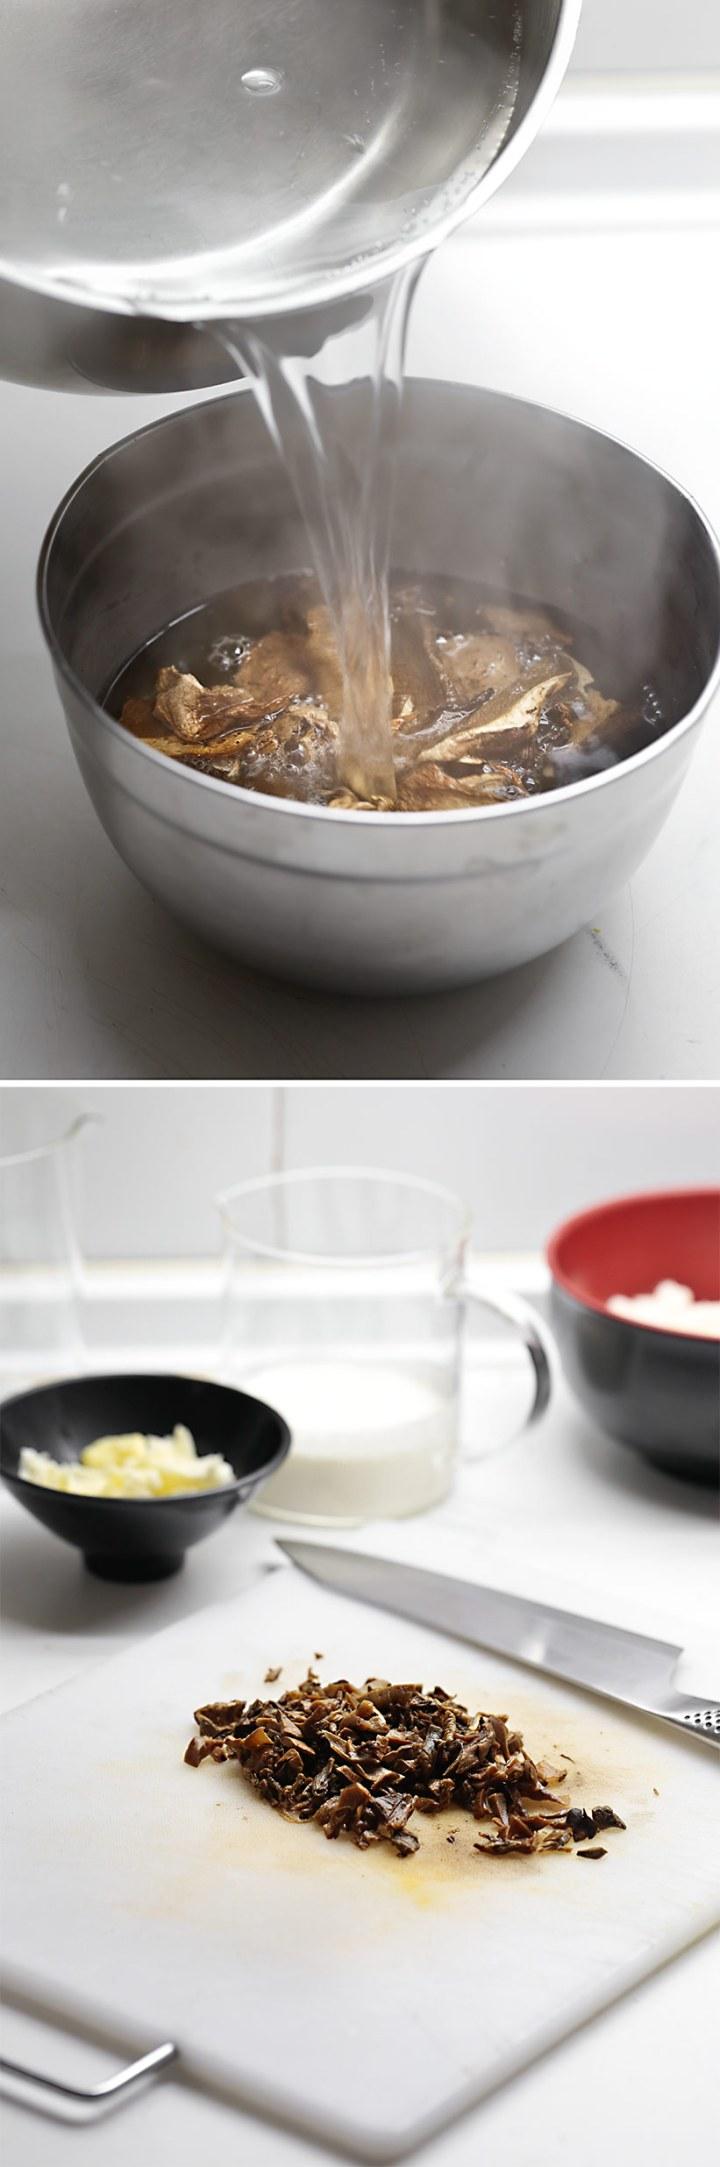 Receta espagueti con nata y boletus